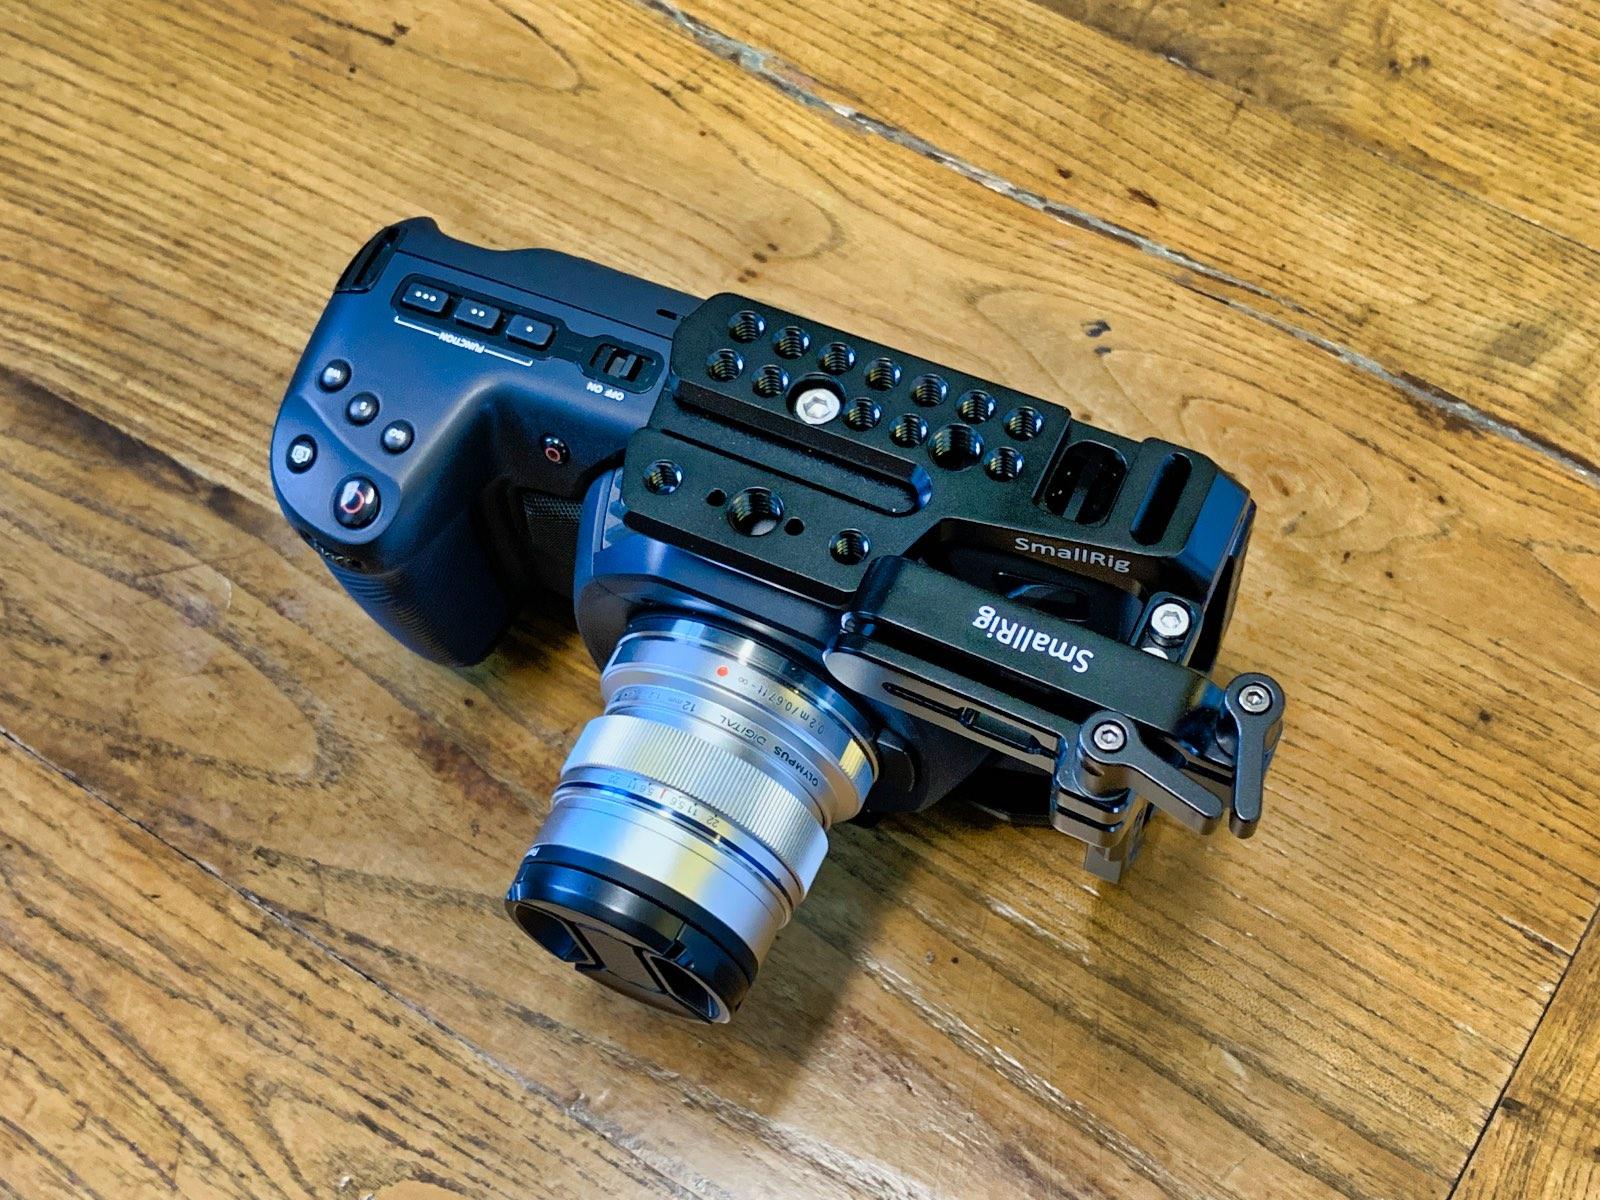 Caging the illusive Blackmagic Pocket Cinema Camera 4K | Photofocus